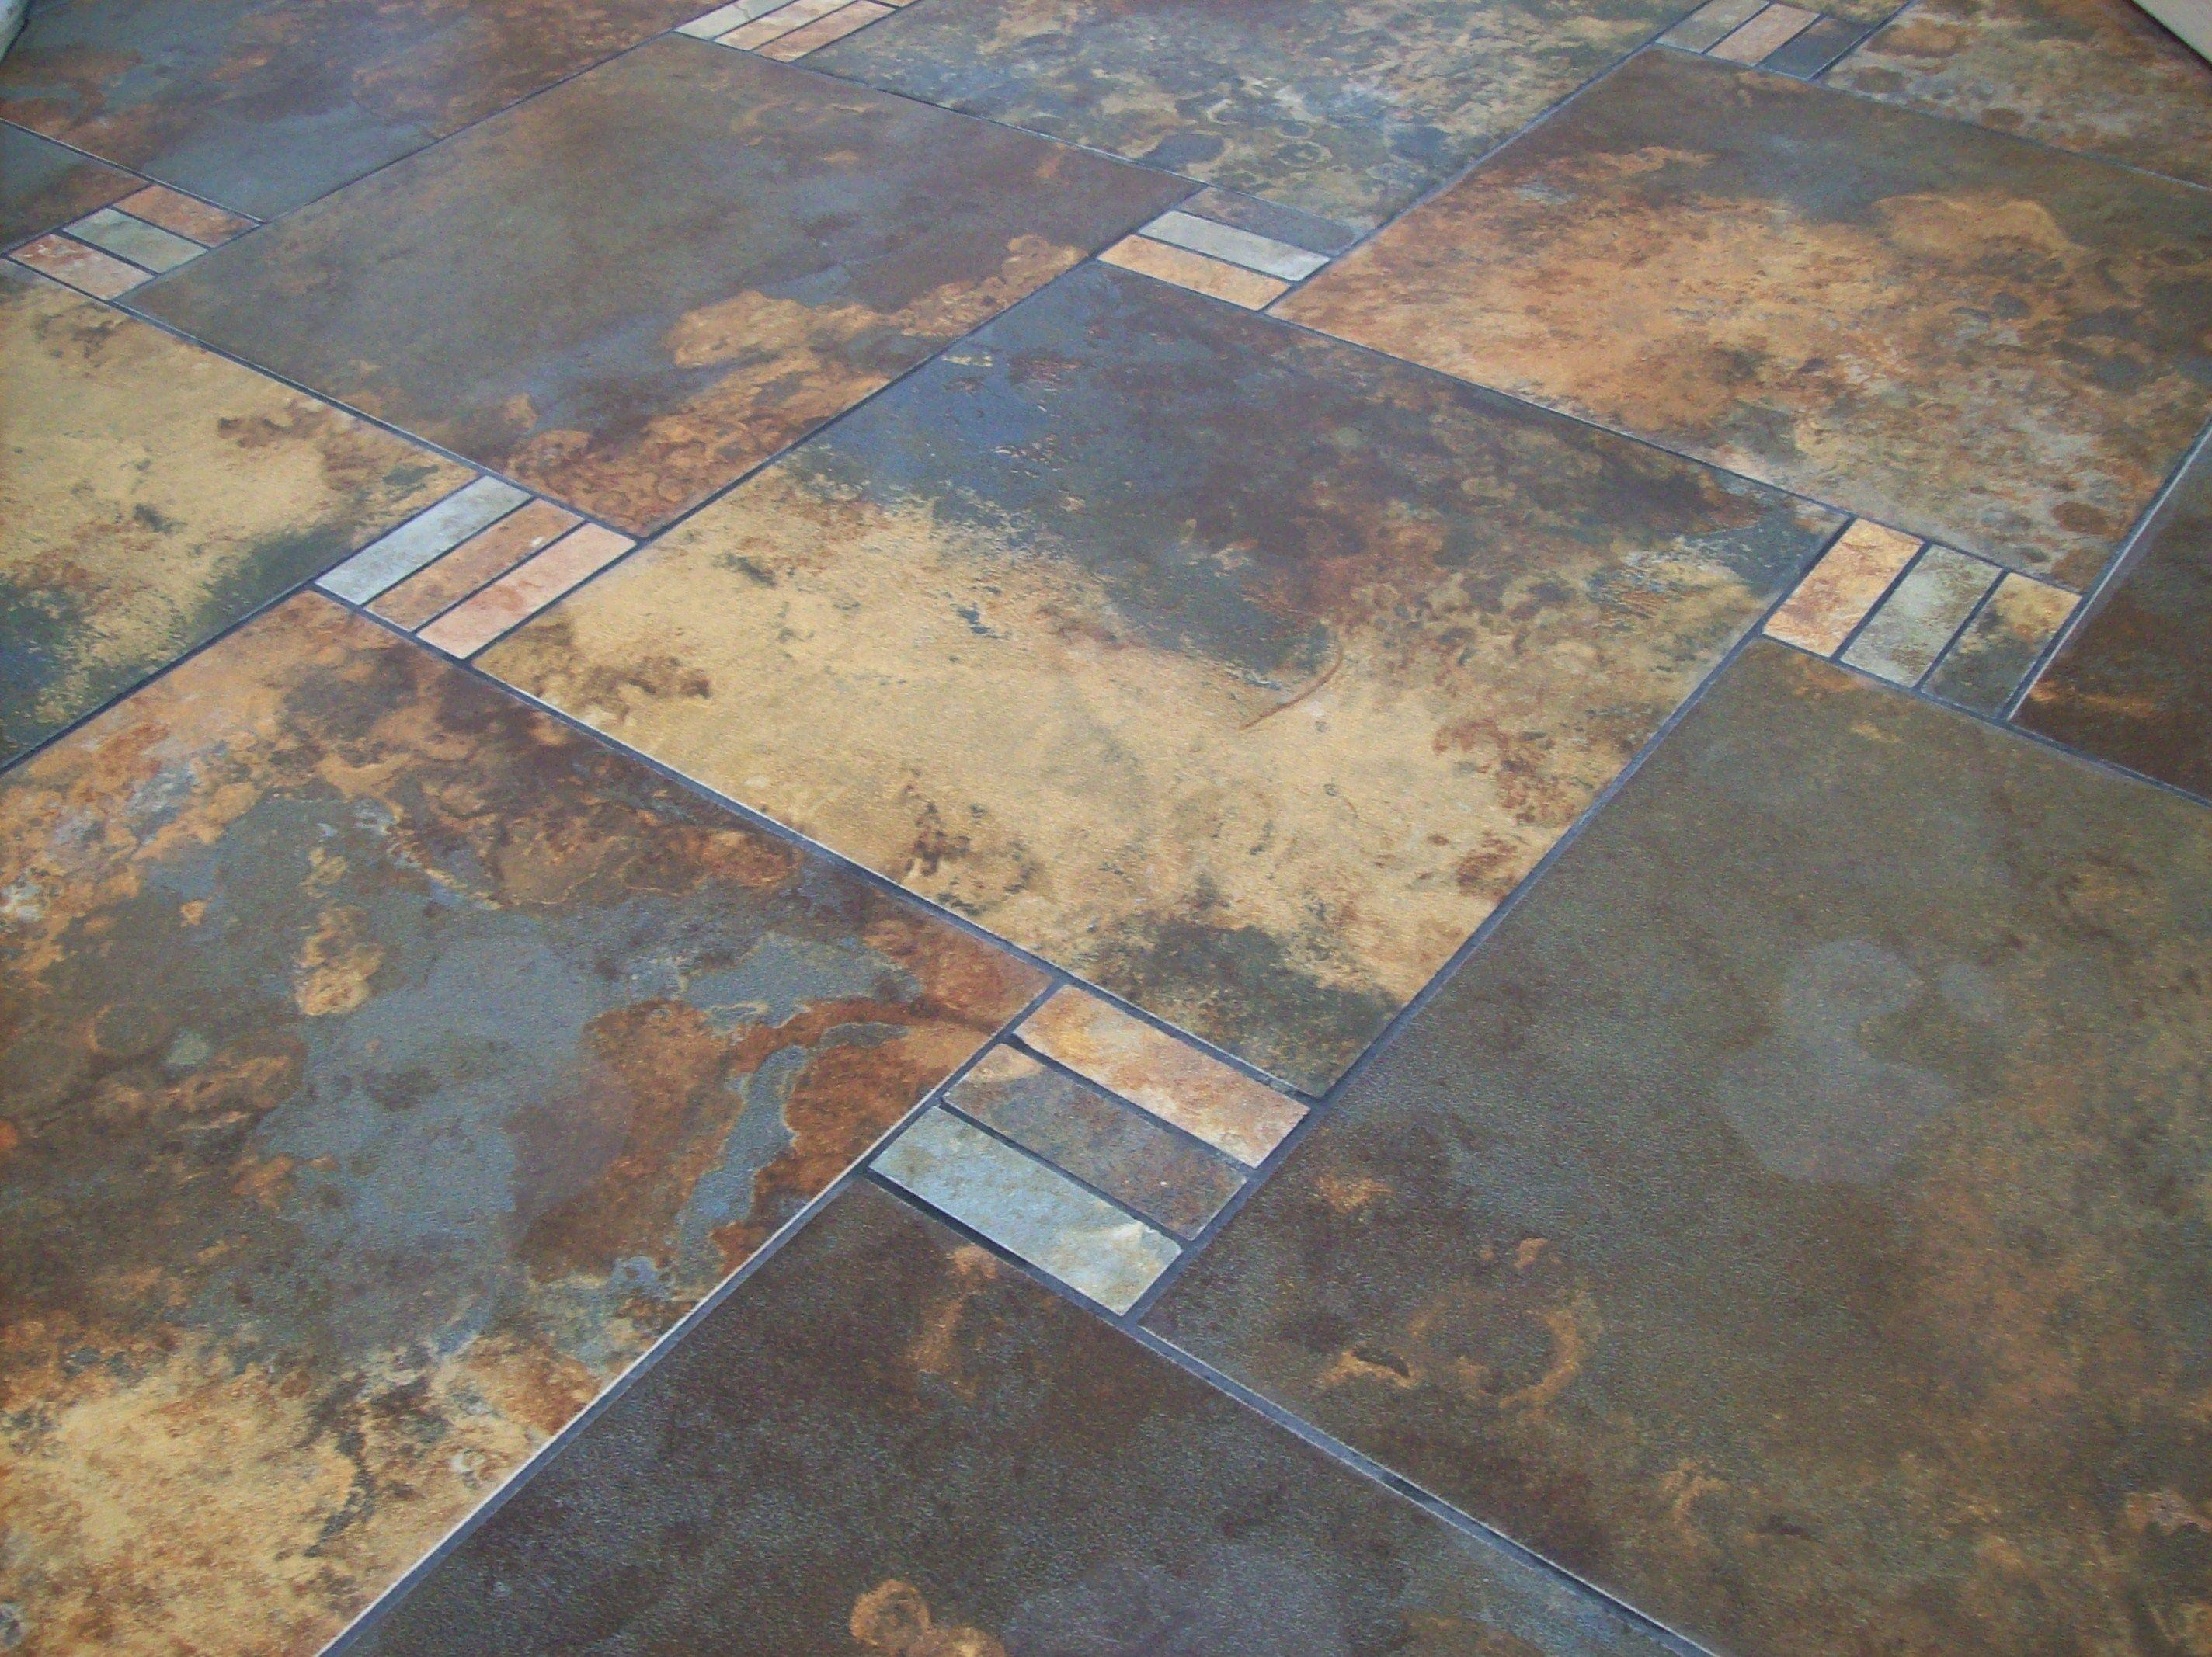 Tile patterns with 16x16 tile random tile patterns in flooring tile patterns with 16x16 tile random tile patterns in flooring supplies compare prices dailygadgetfo Gallery